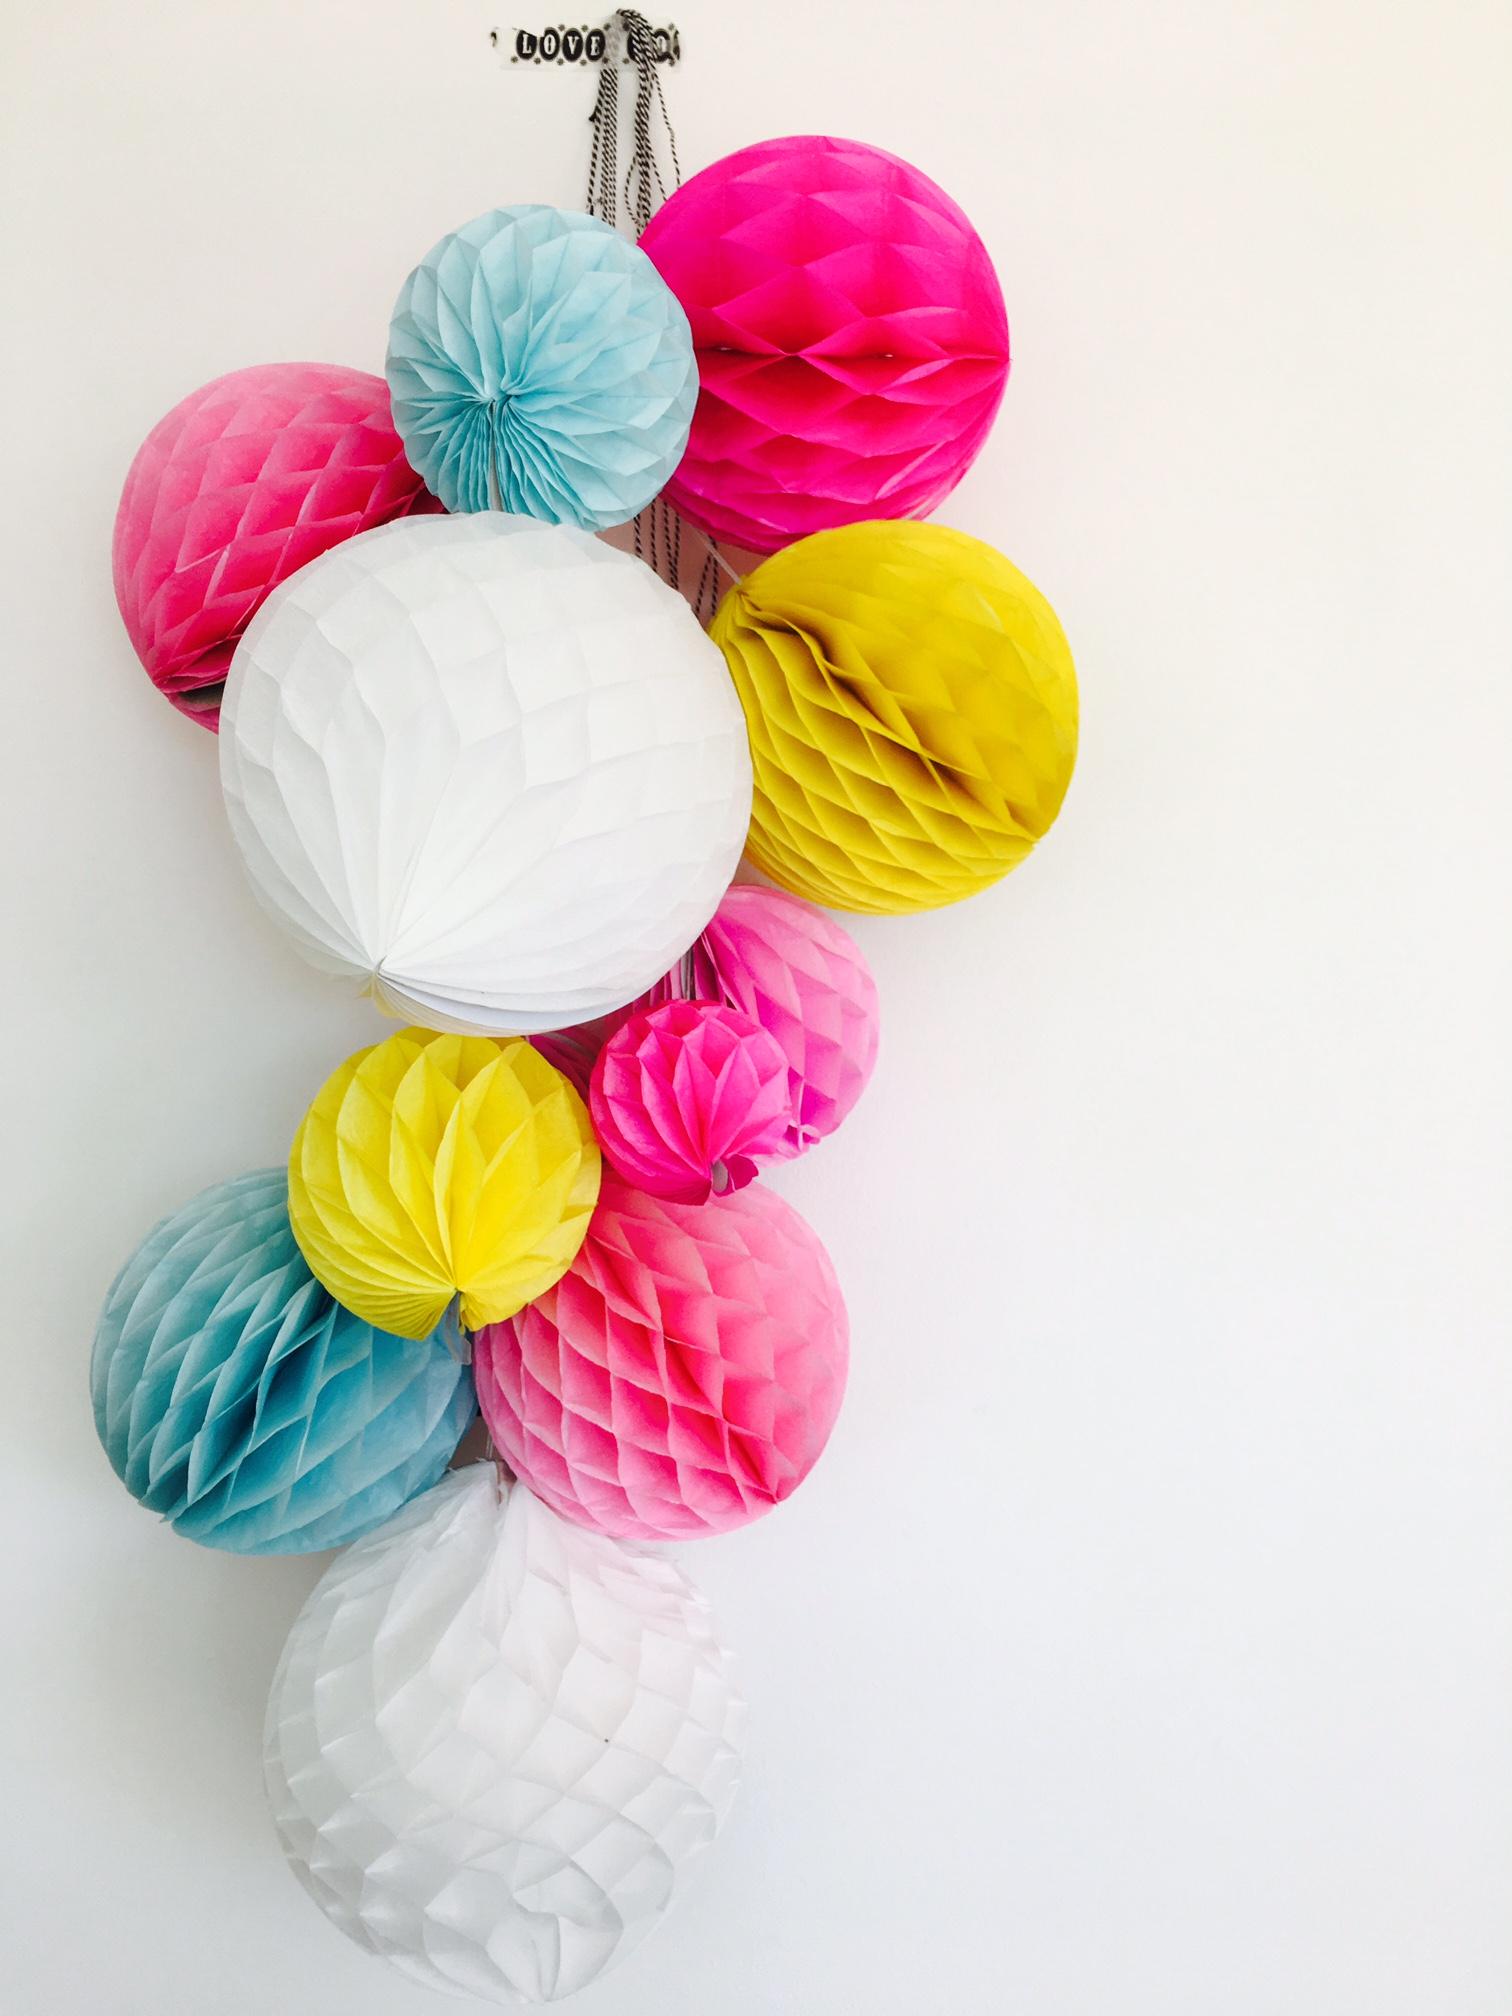 Shop Sweet Lulu honeycombs